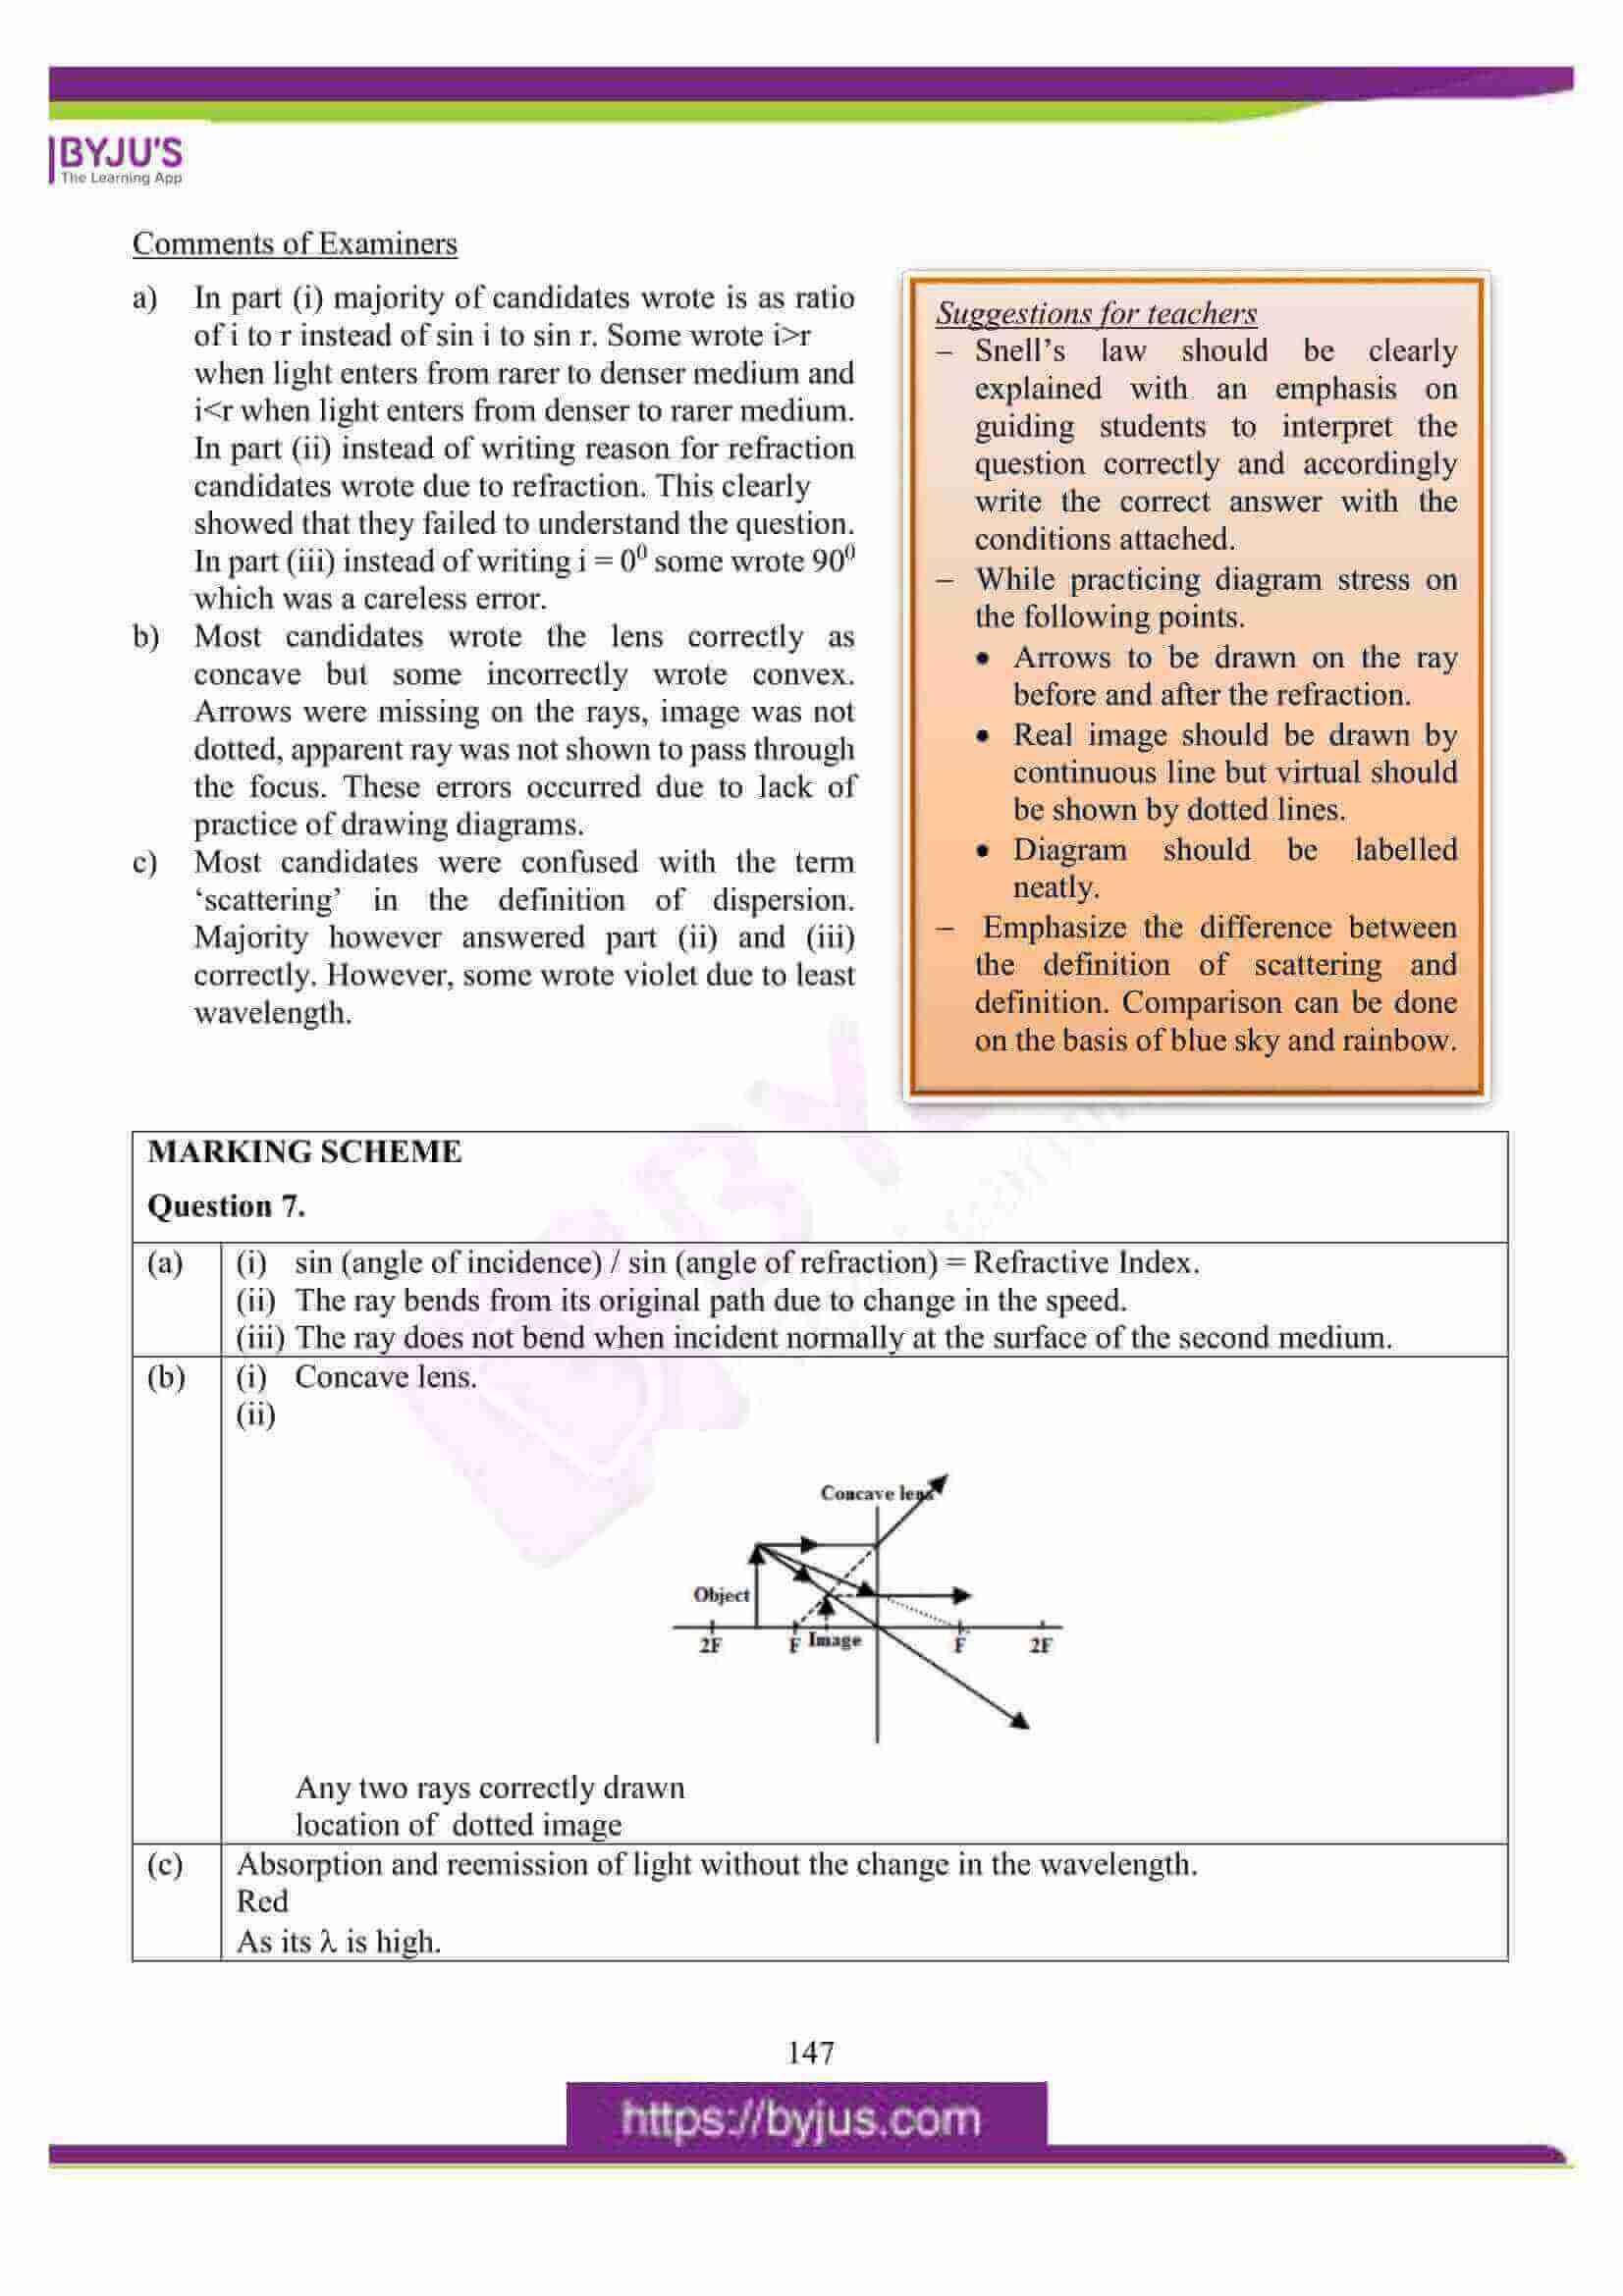 icse class 10 physics question paper solution 2016 12